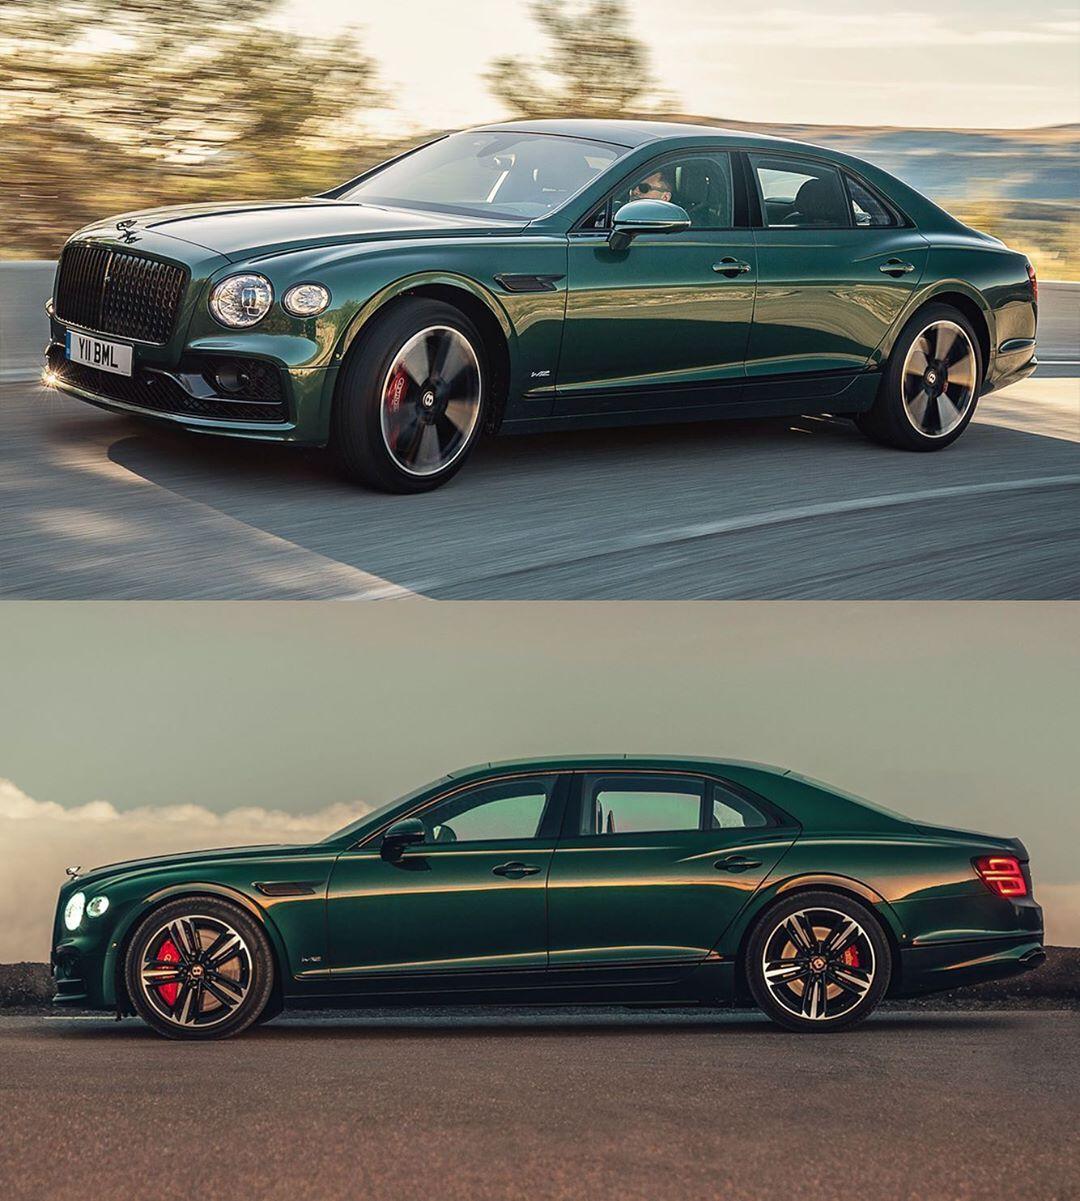 Car Design World On Instagram 2020 Bentley Flying Spur In British Racing Green Cardesign Car Design Bentley Flying Spur British Racing Green Bentley Car